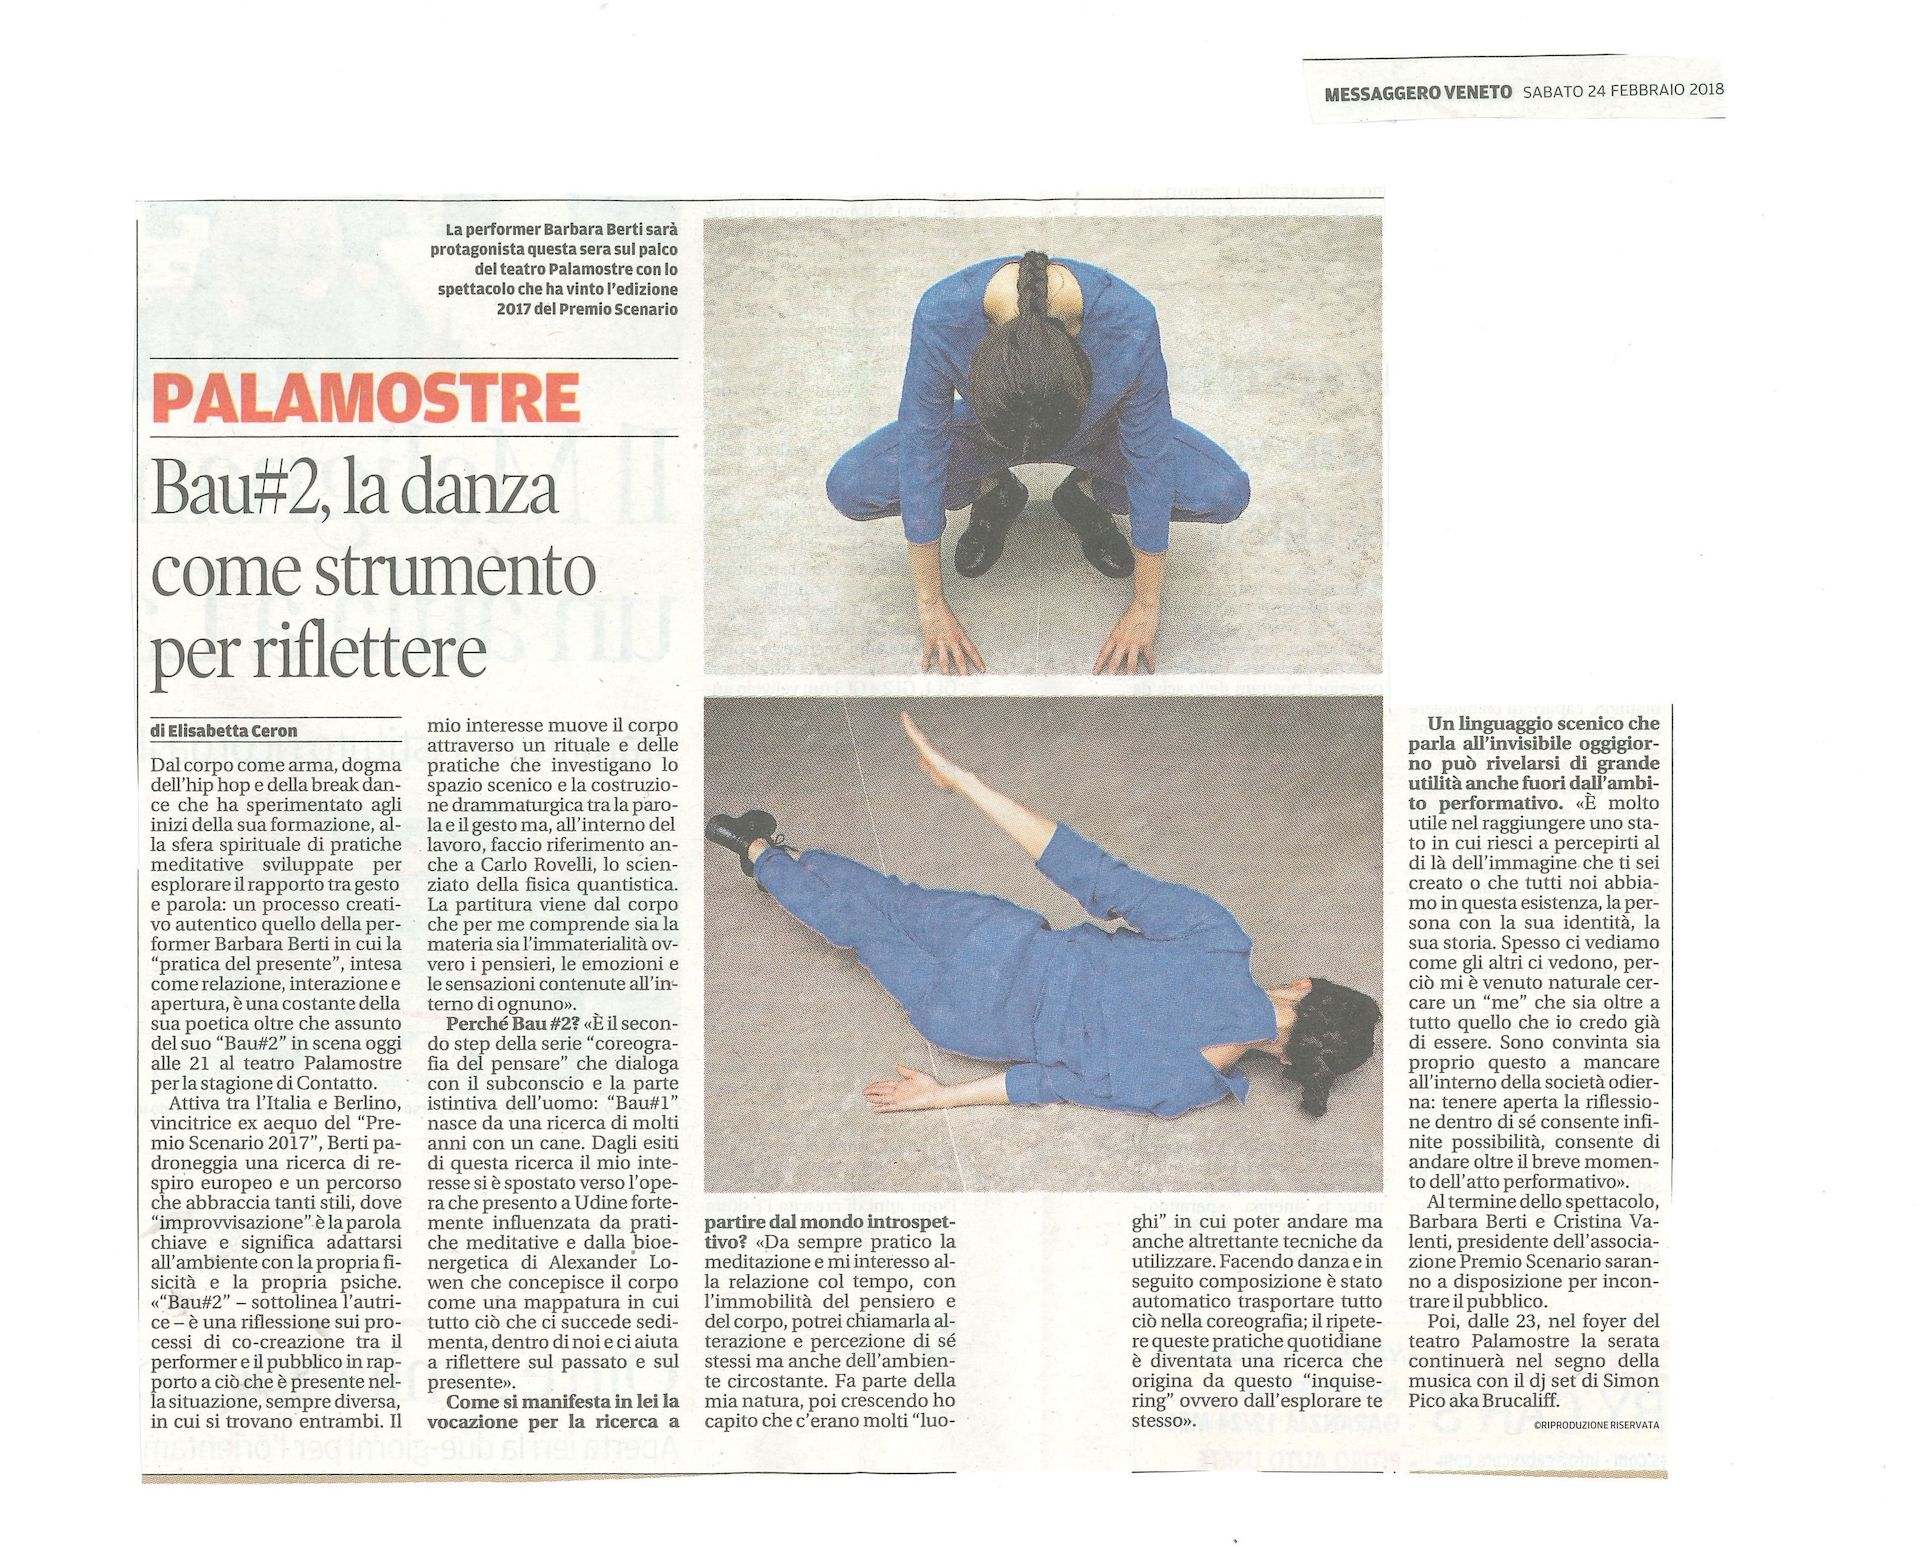 Intervista / Barbara Berti / Bau #2 / Messaggero Veneto / TIR Danza